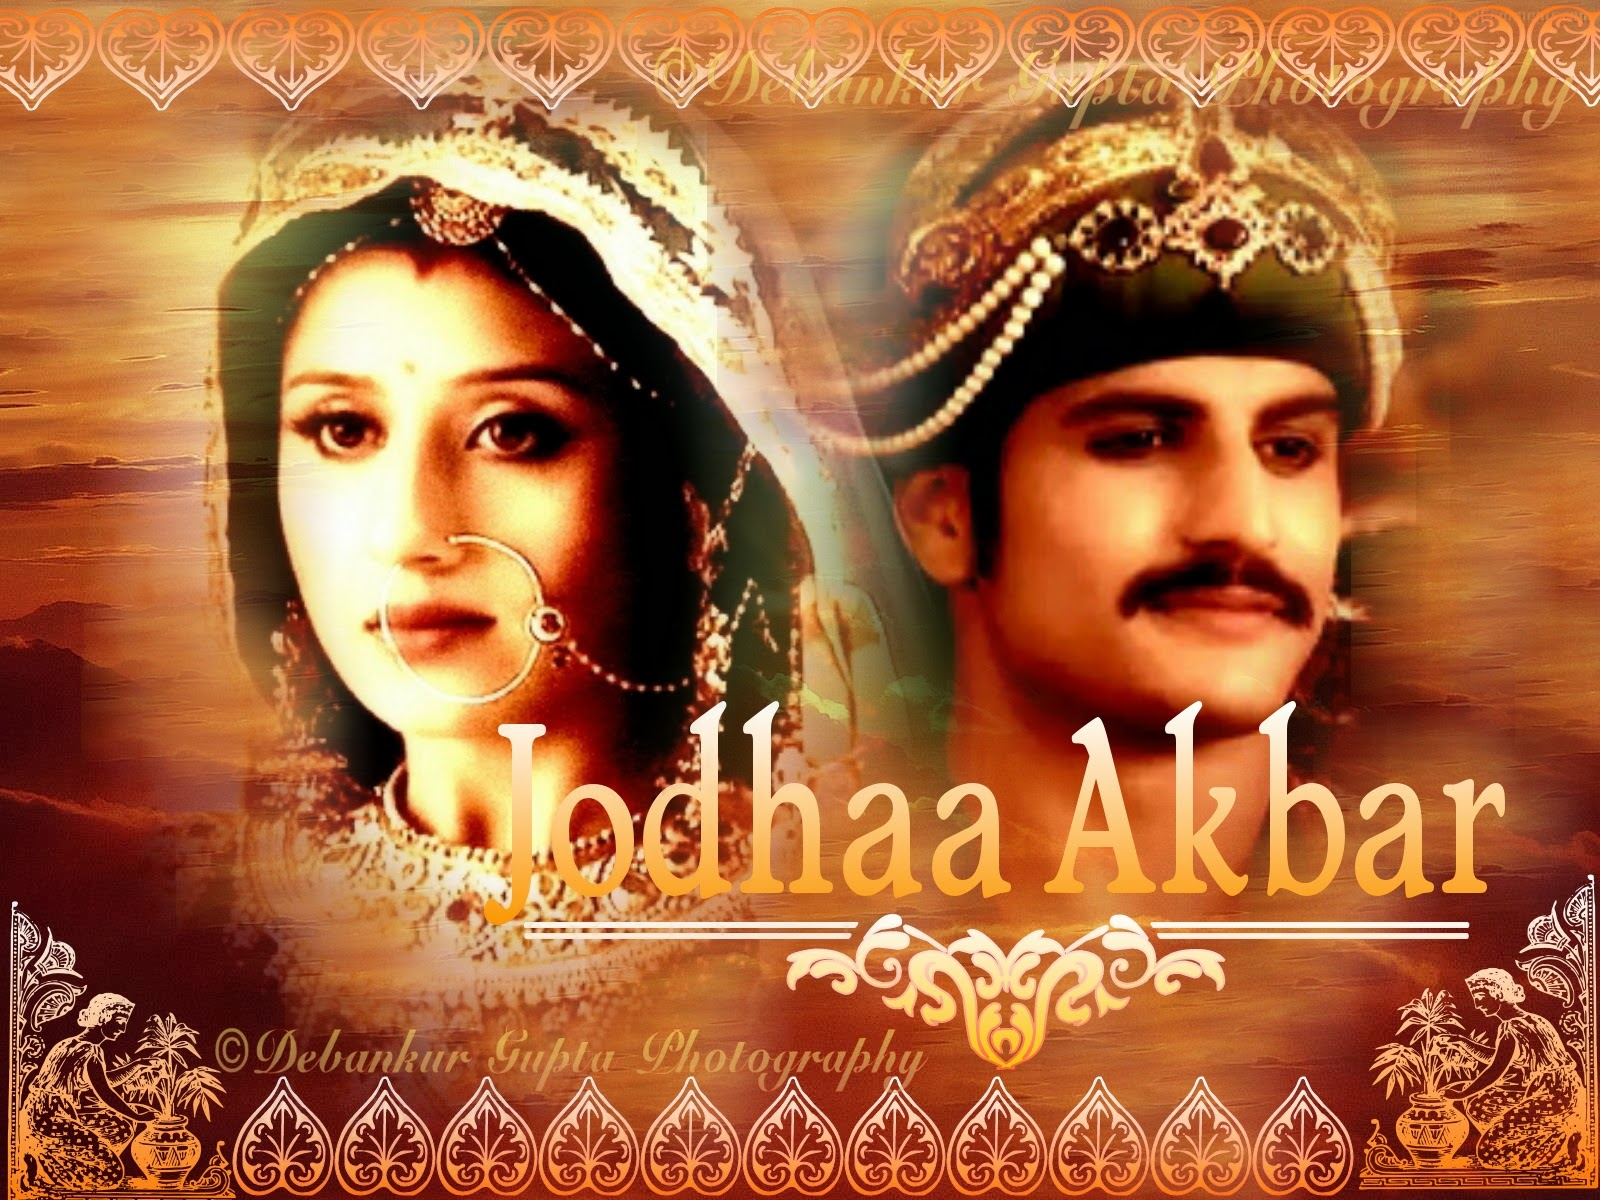 boradcast by zee tv serial jodha akbar edited pics